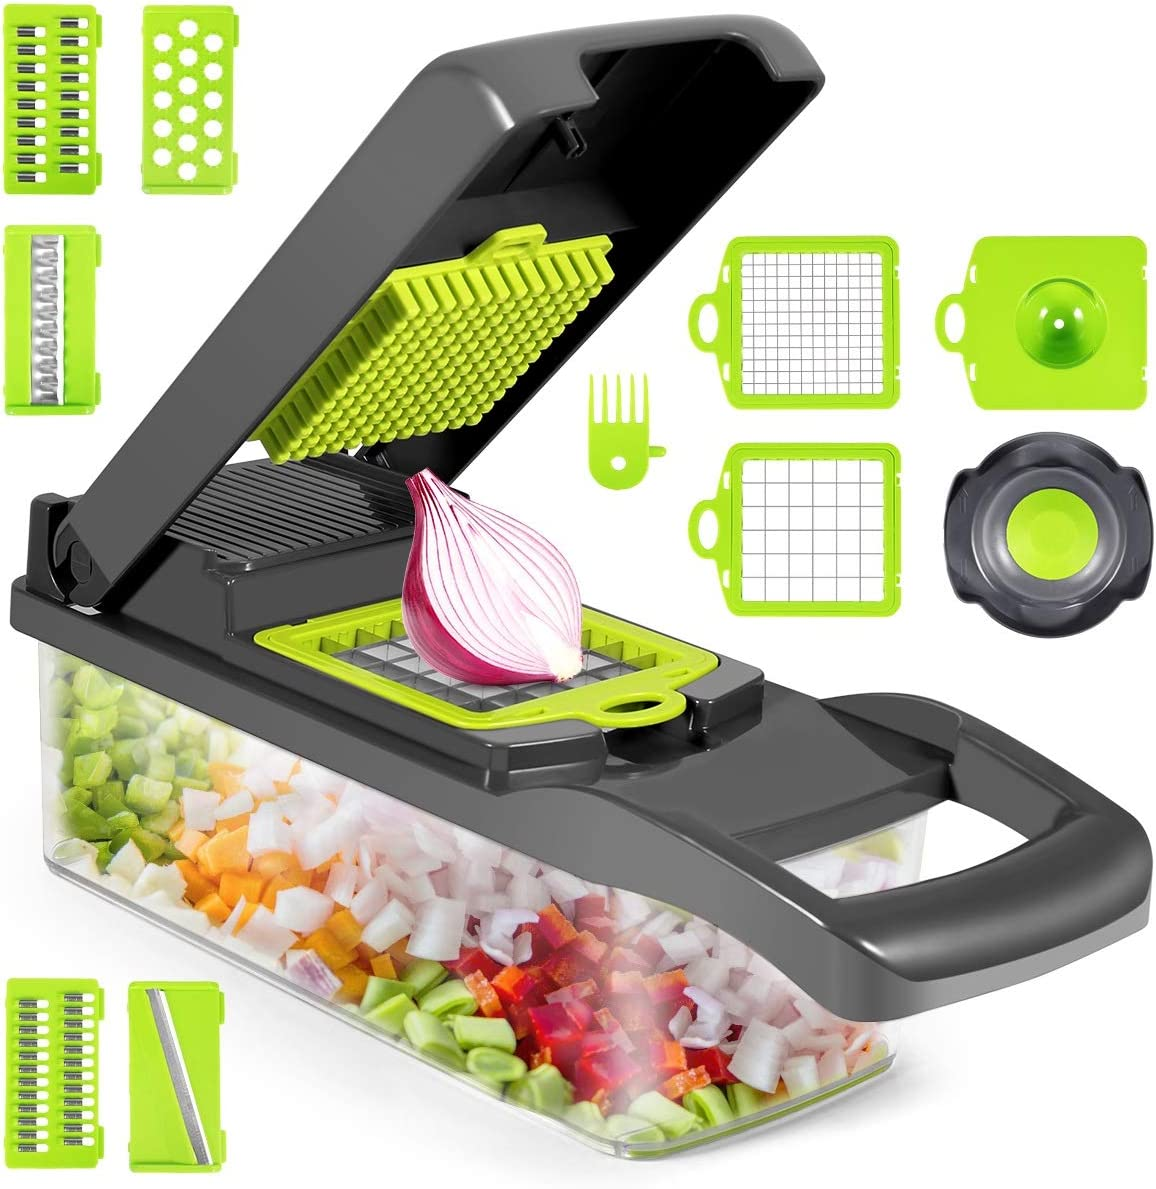 Vegetable Chopper, 12 in 1 Multifunctional Slicer with Container, Adjustable Mandolin Slicer, Household Kitchen Cutter for Veggie, Fruit Salad, Onion, Potato